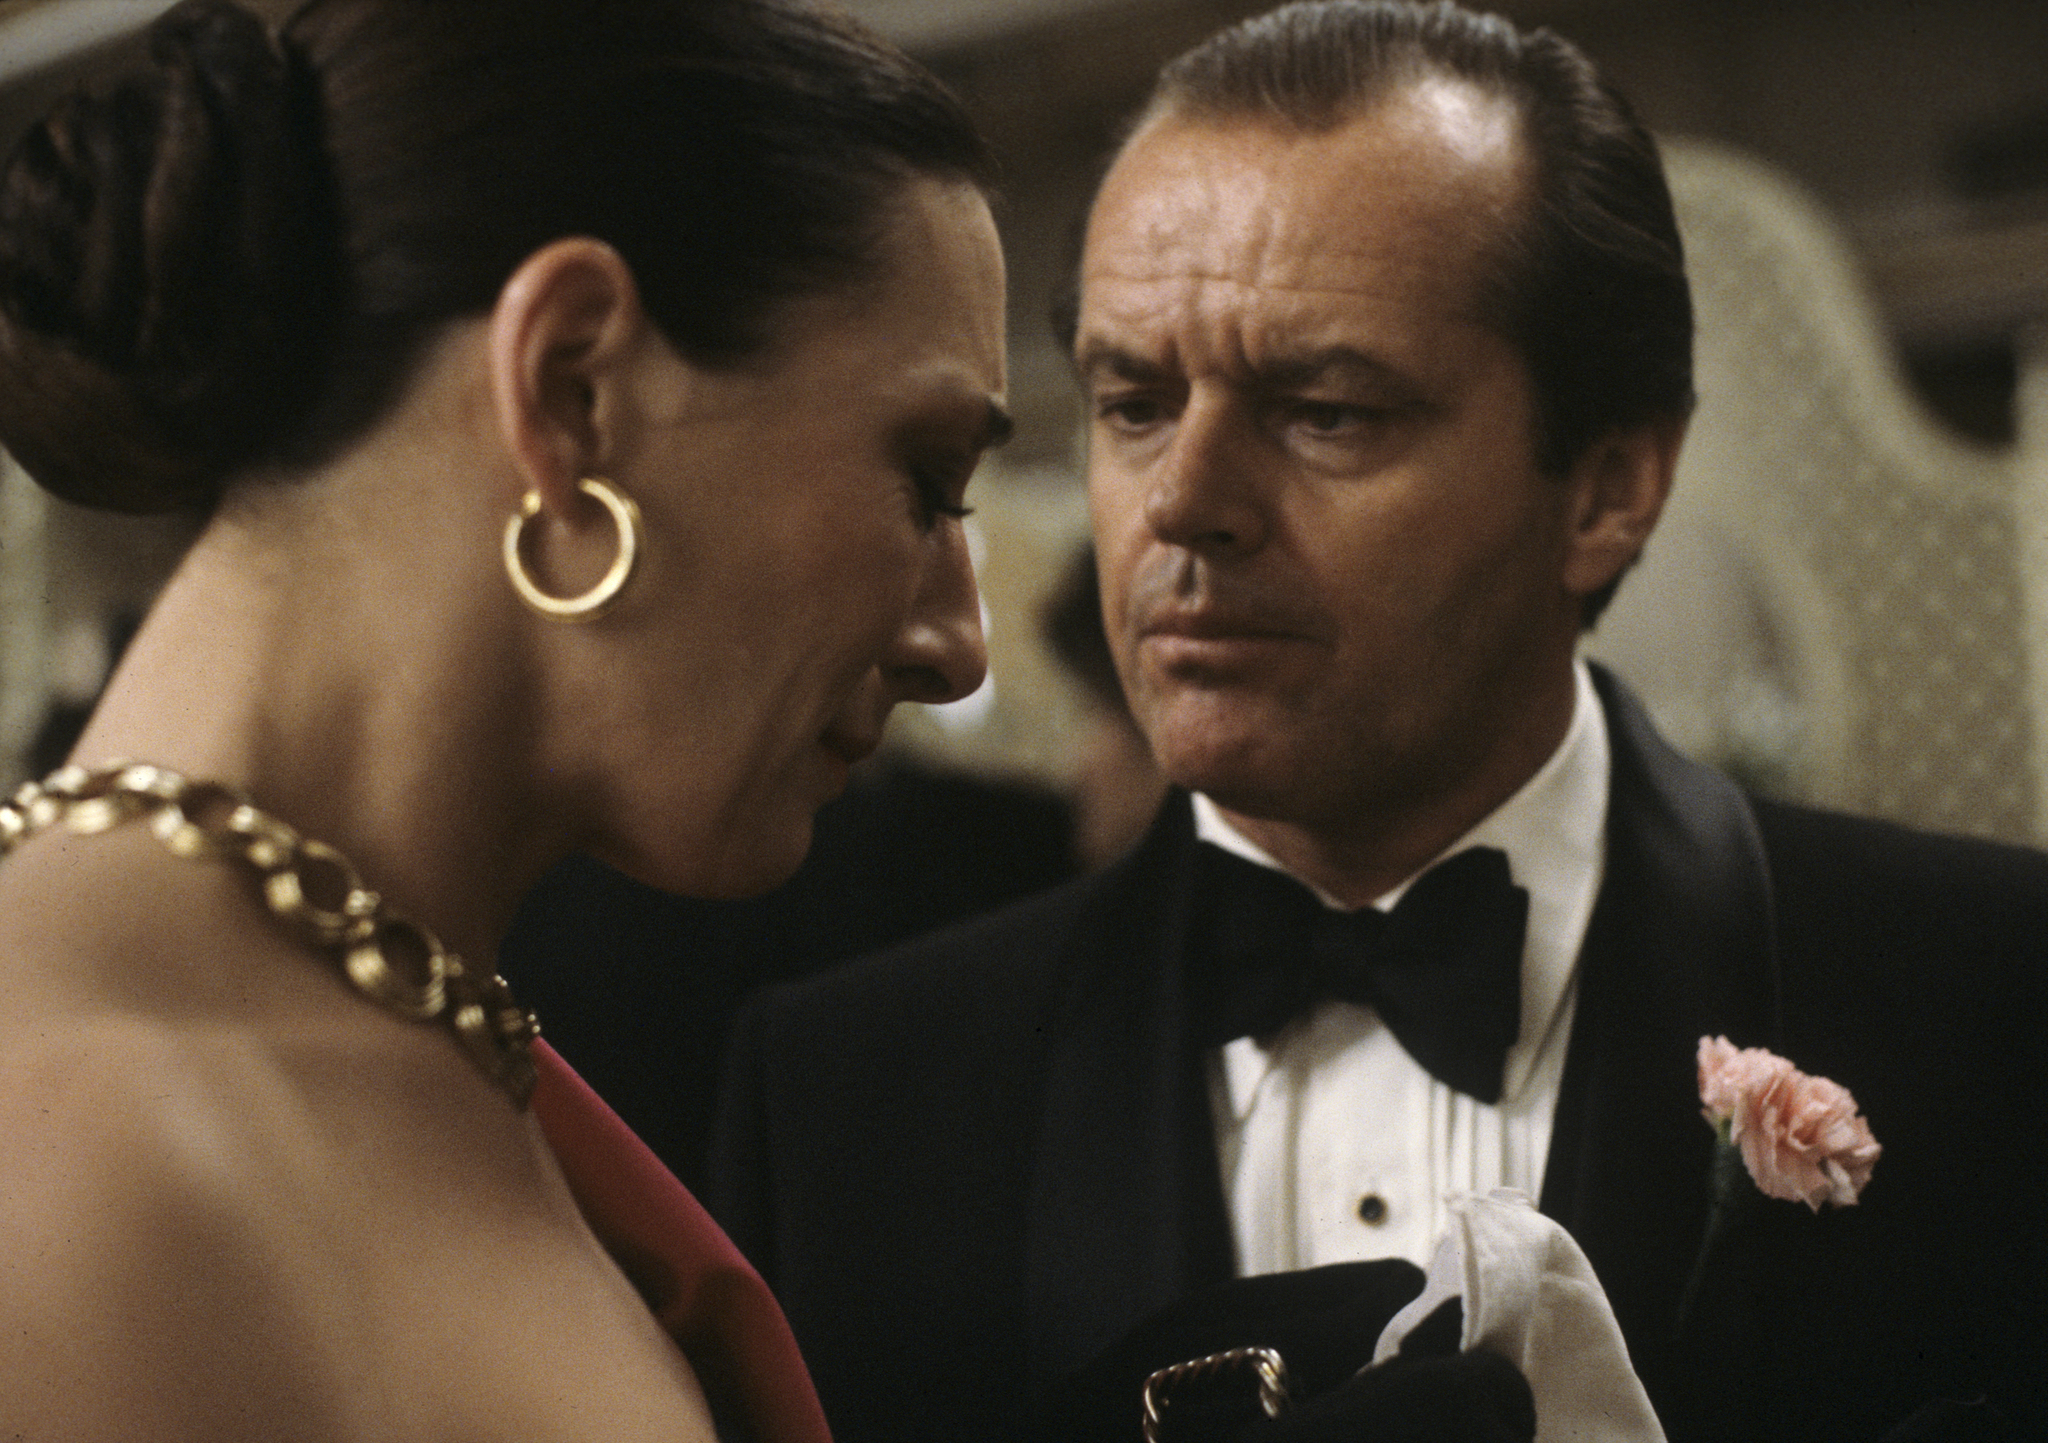 Jack Nicholson and Anjelica Huston in Prizzi's Honor (1985)